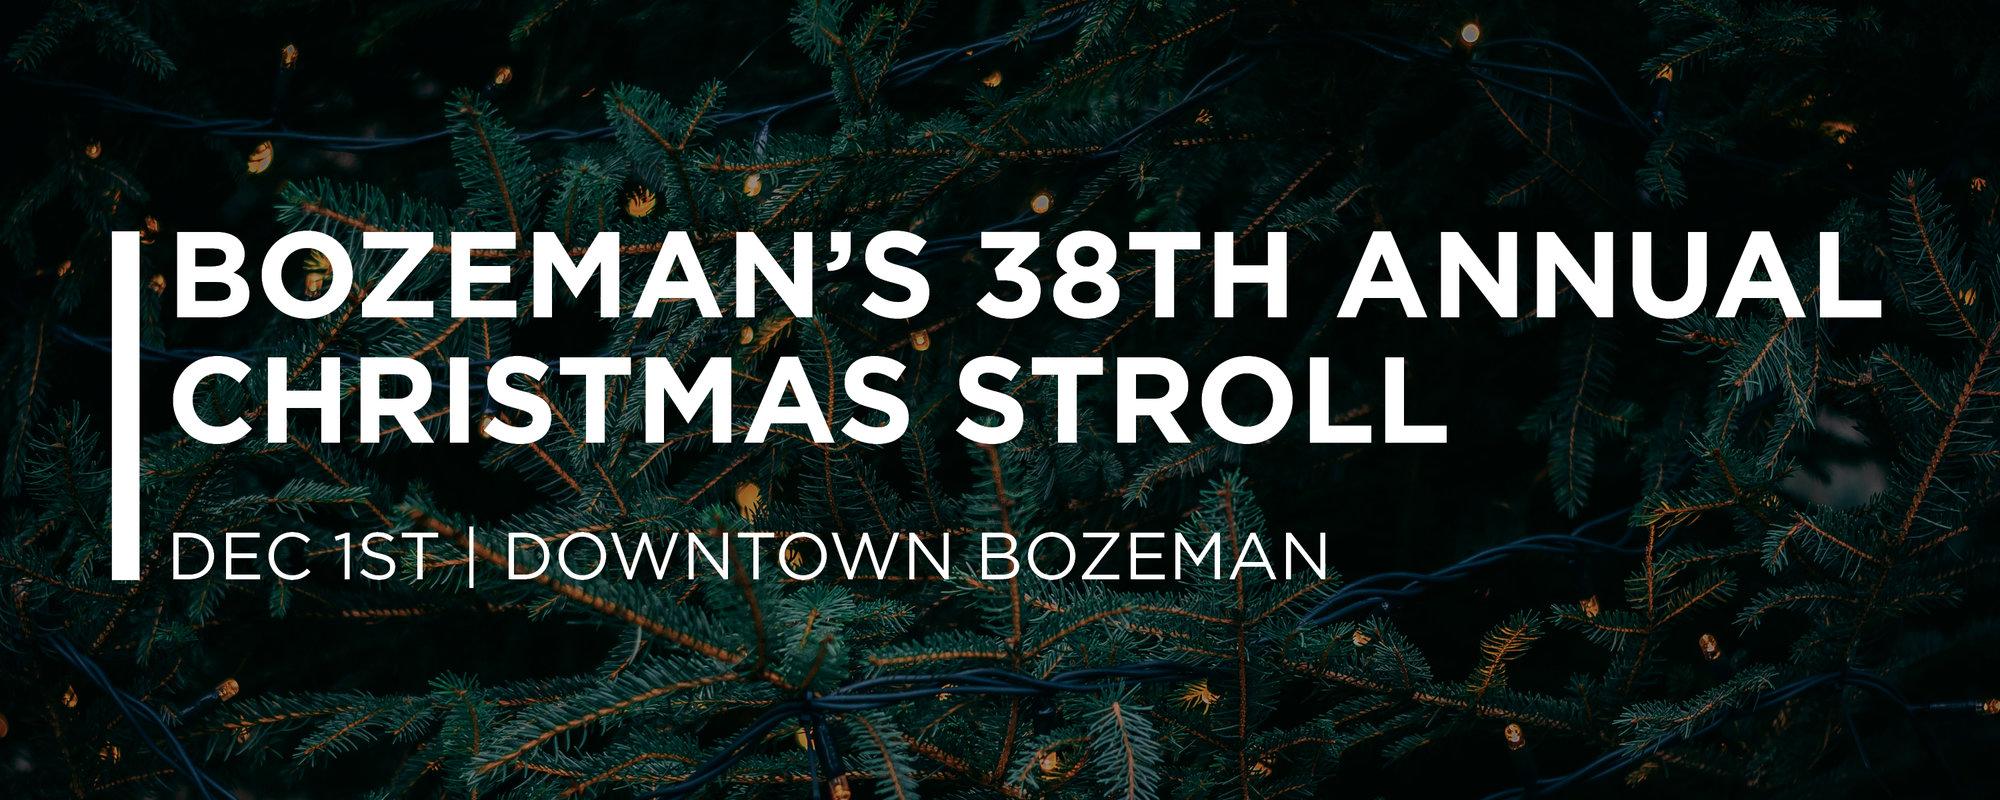 Bozeman's 38th Annual Christmas Stroll